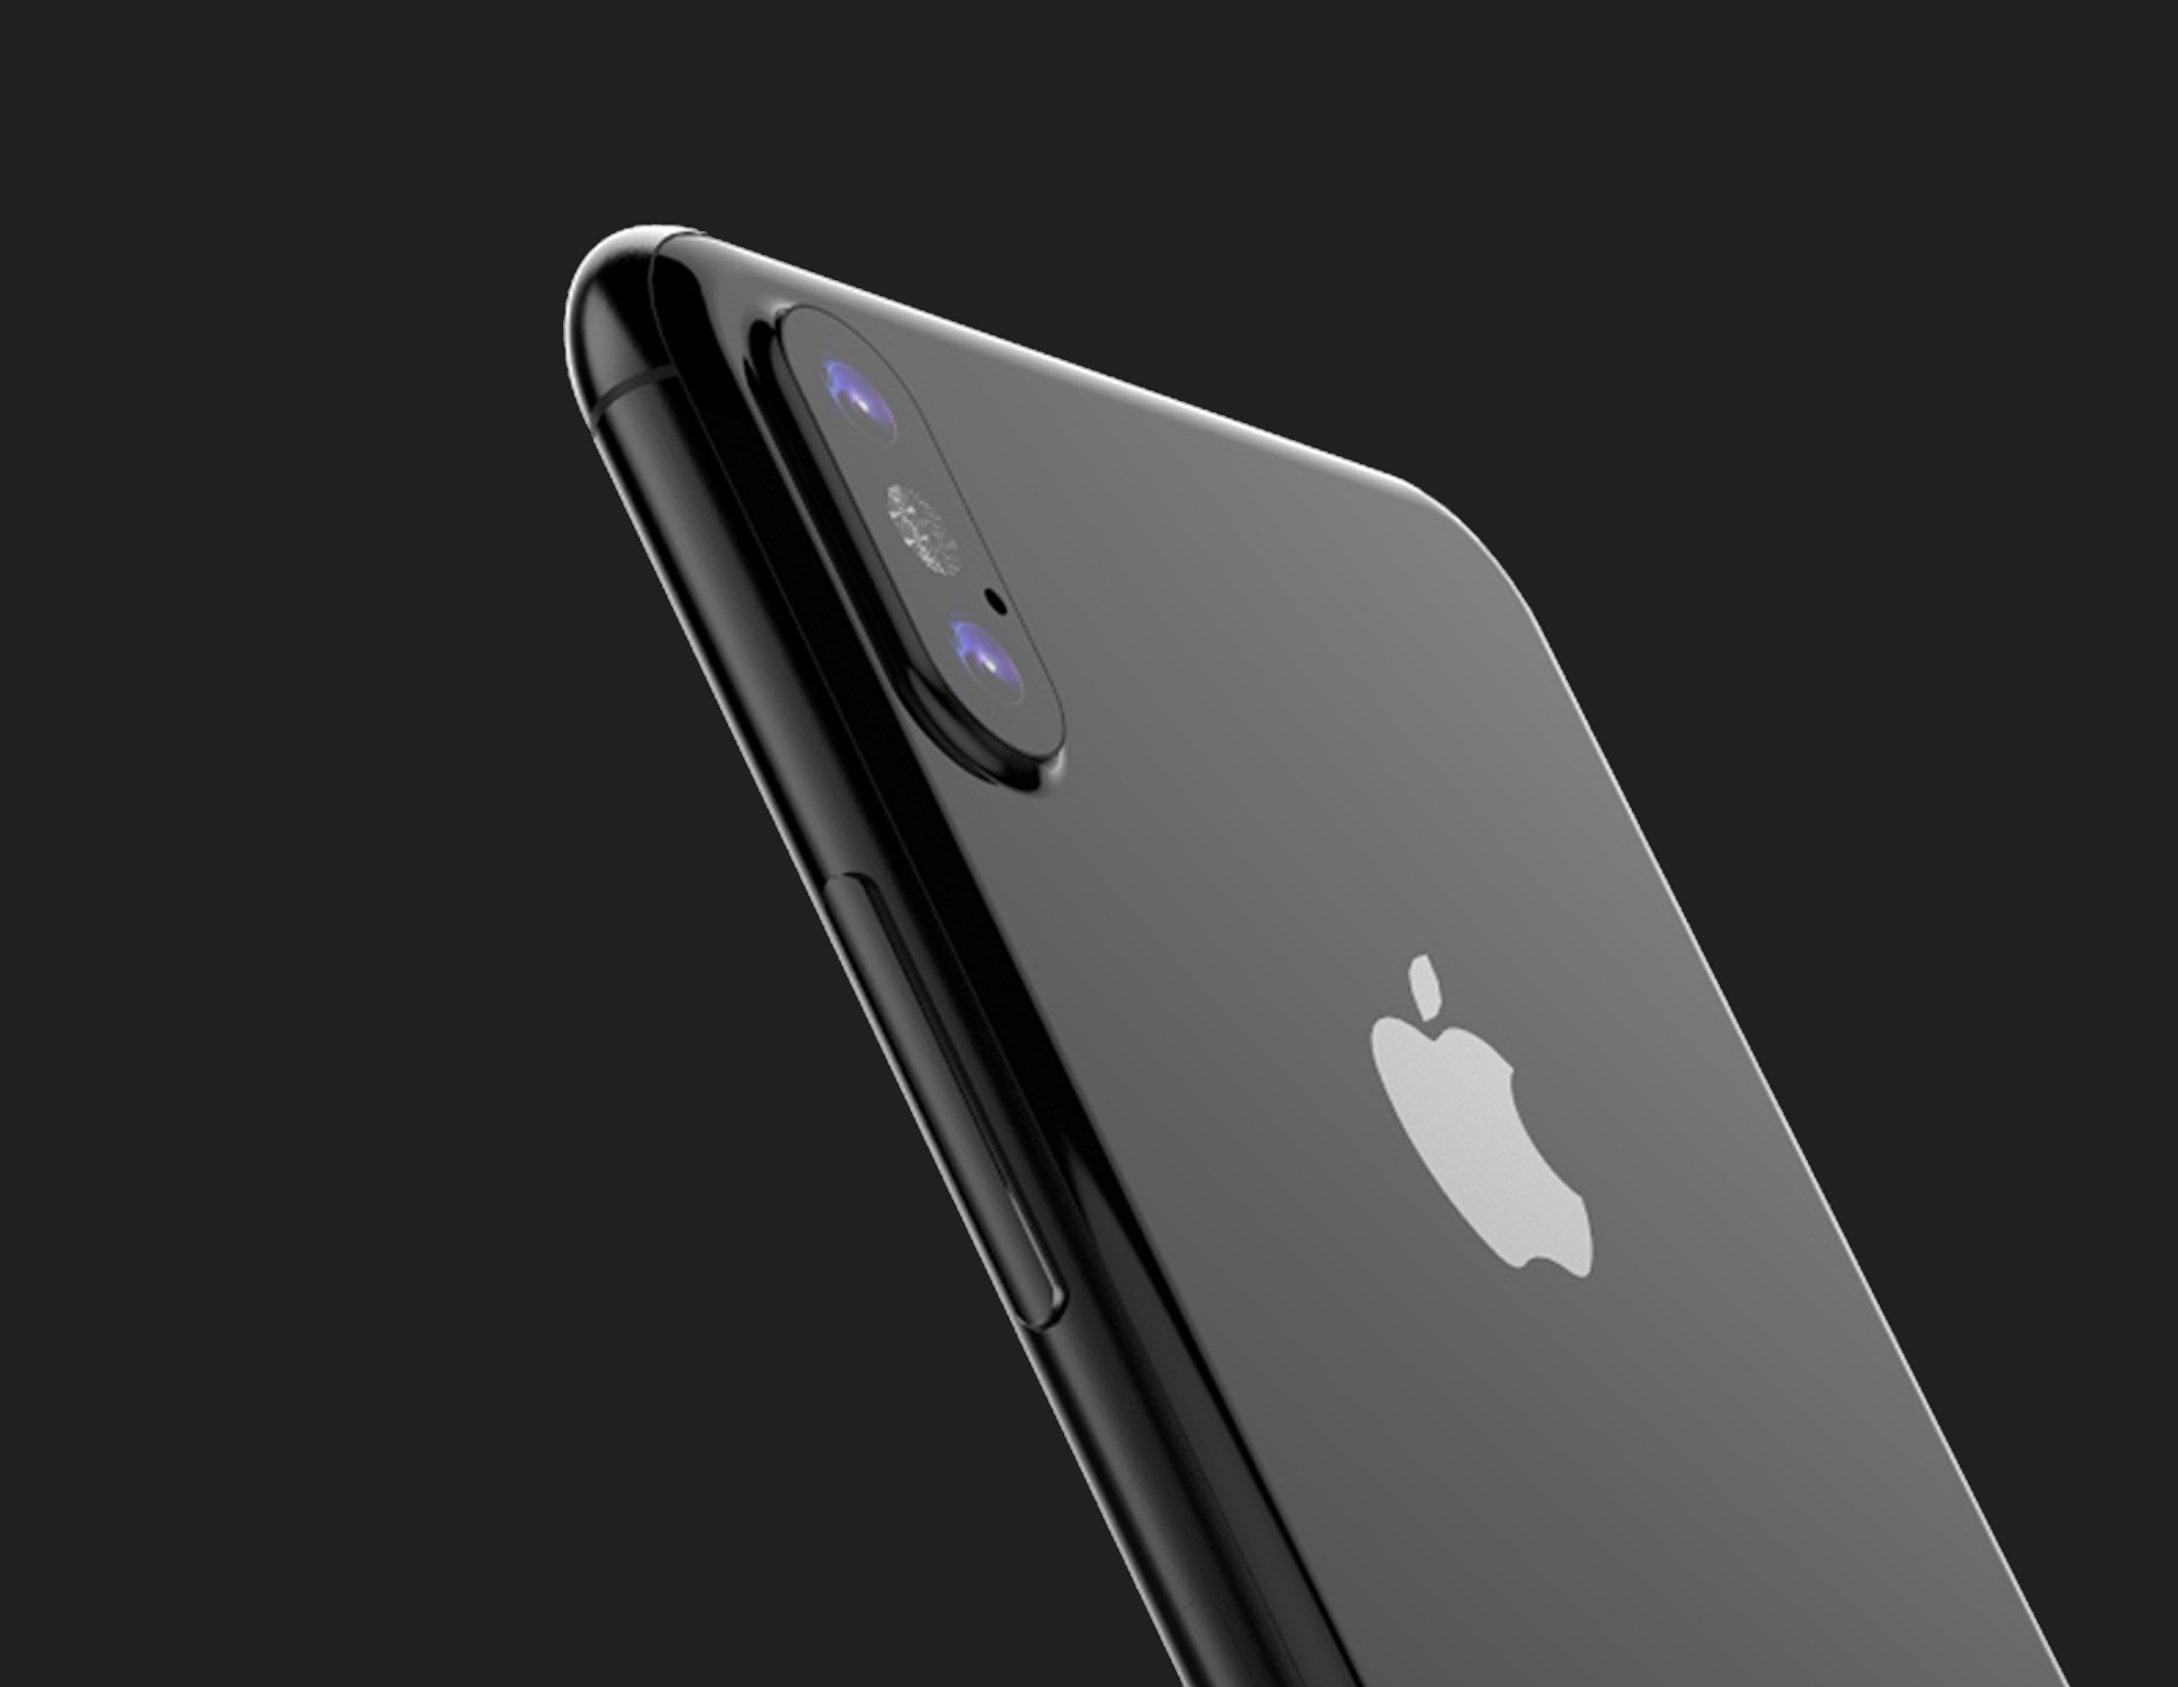 IPhone8 OLEDiPhone 01